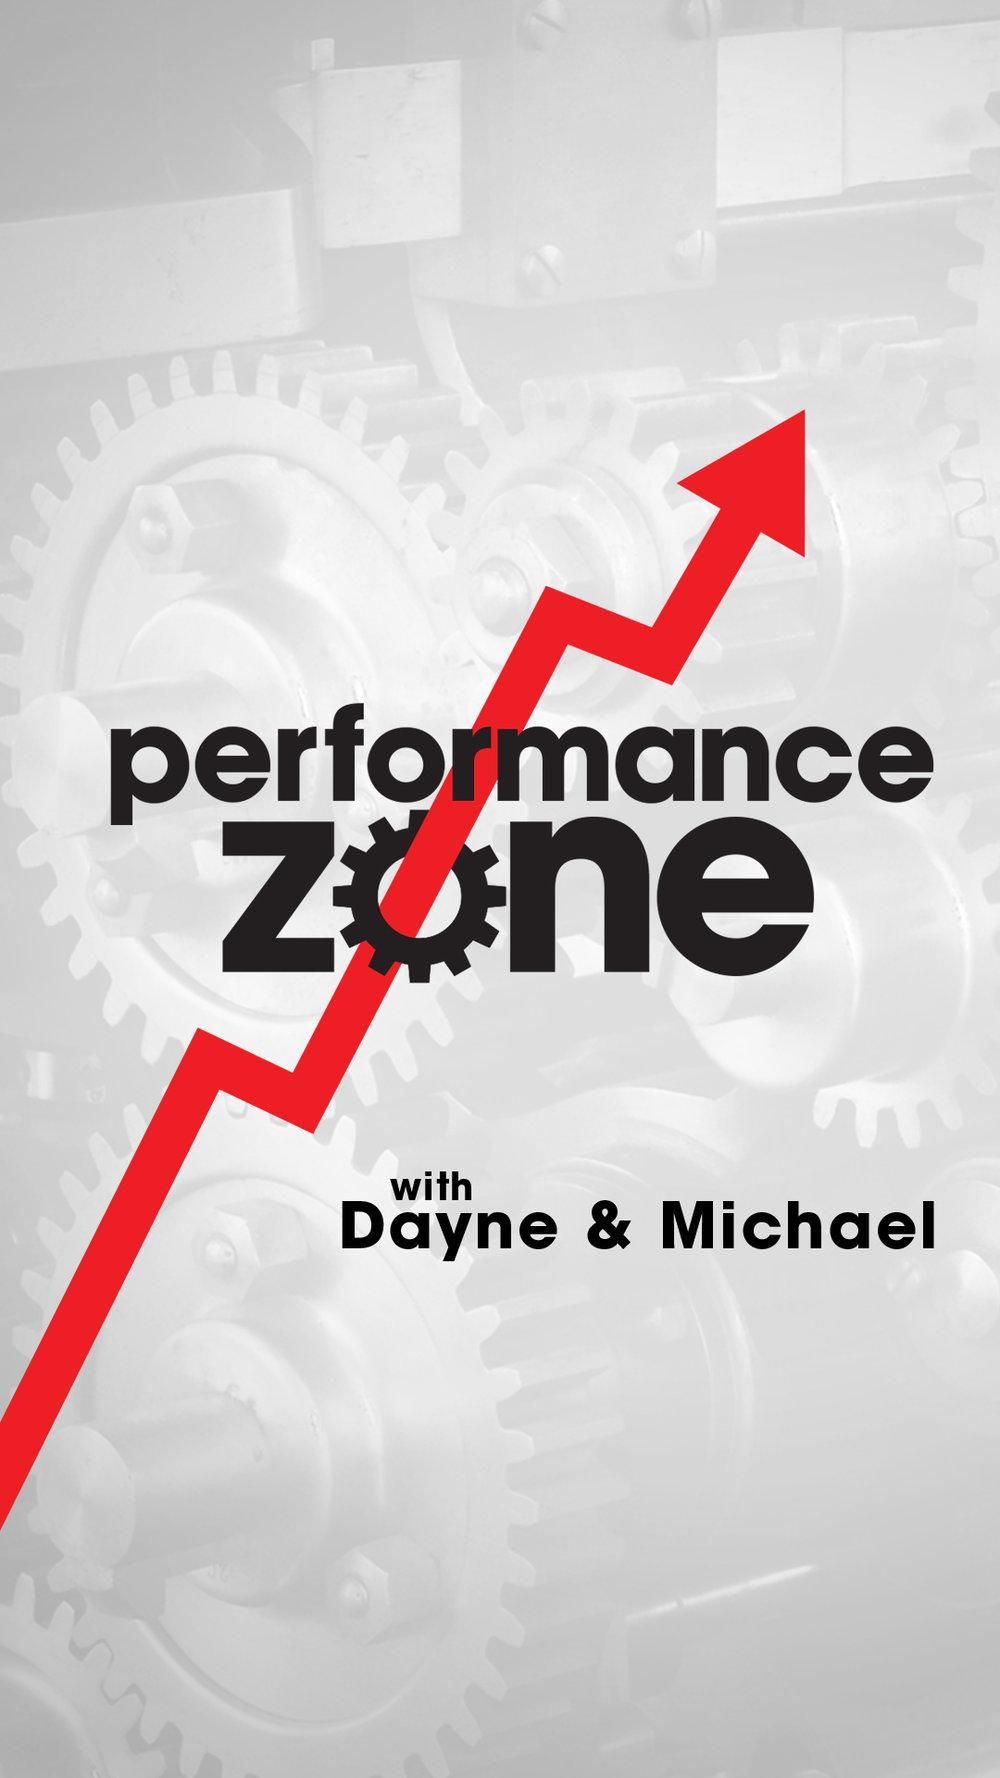 performance zone logo.JPG